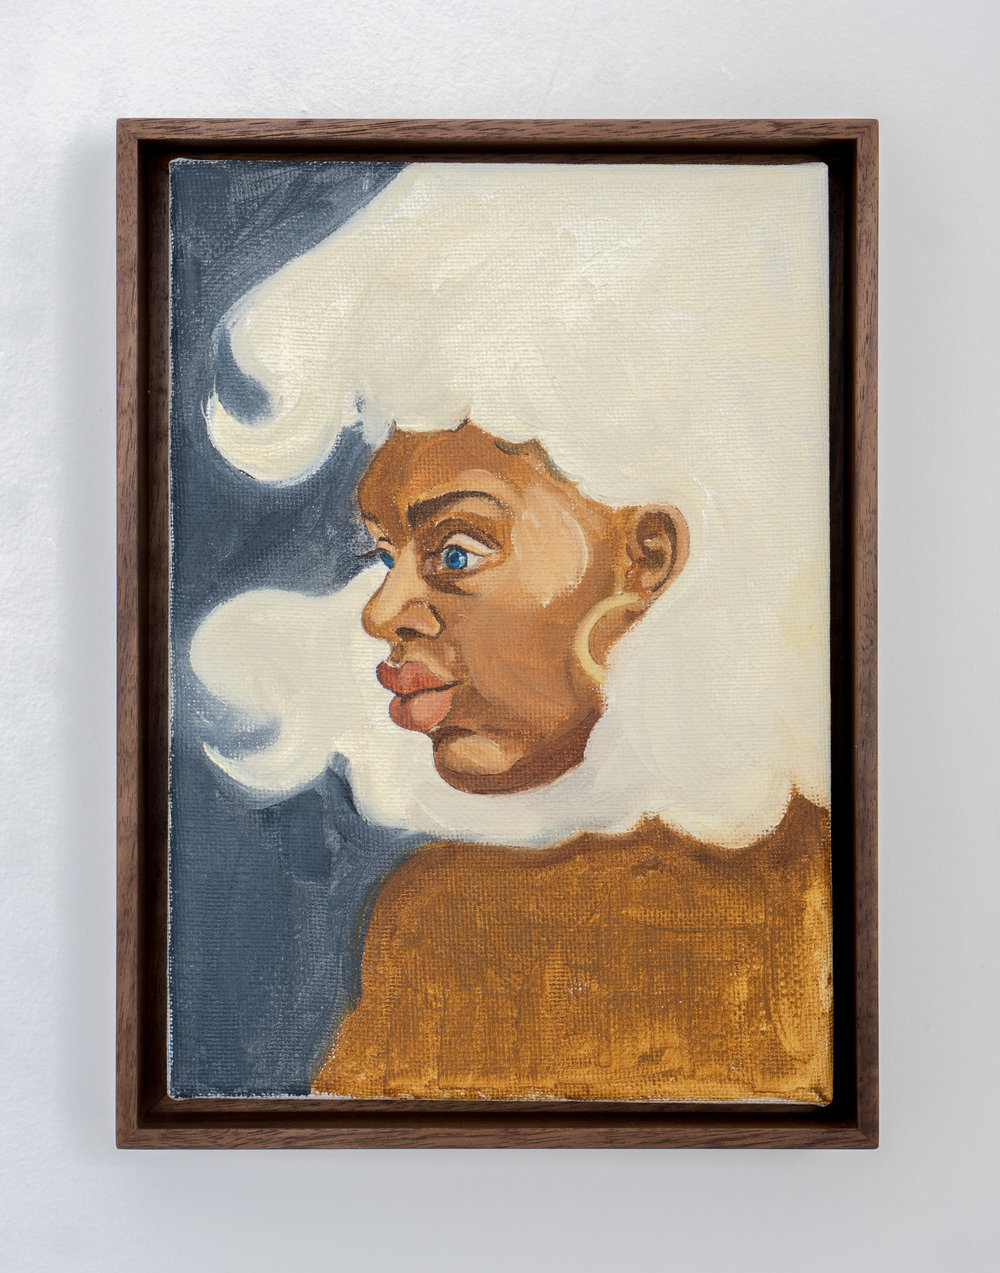 Somaya Critchlow , Toochka,  2018, oil on canvas, 9 x 7.6 inches